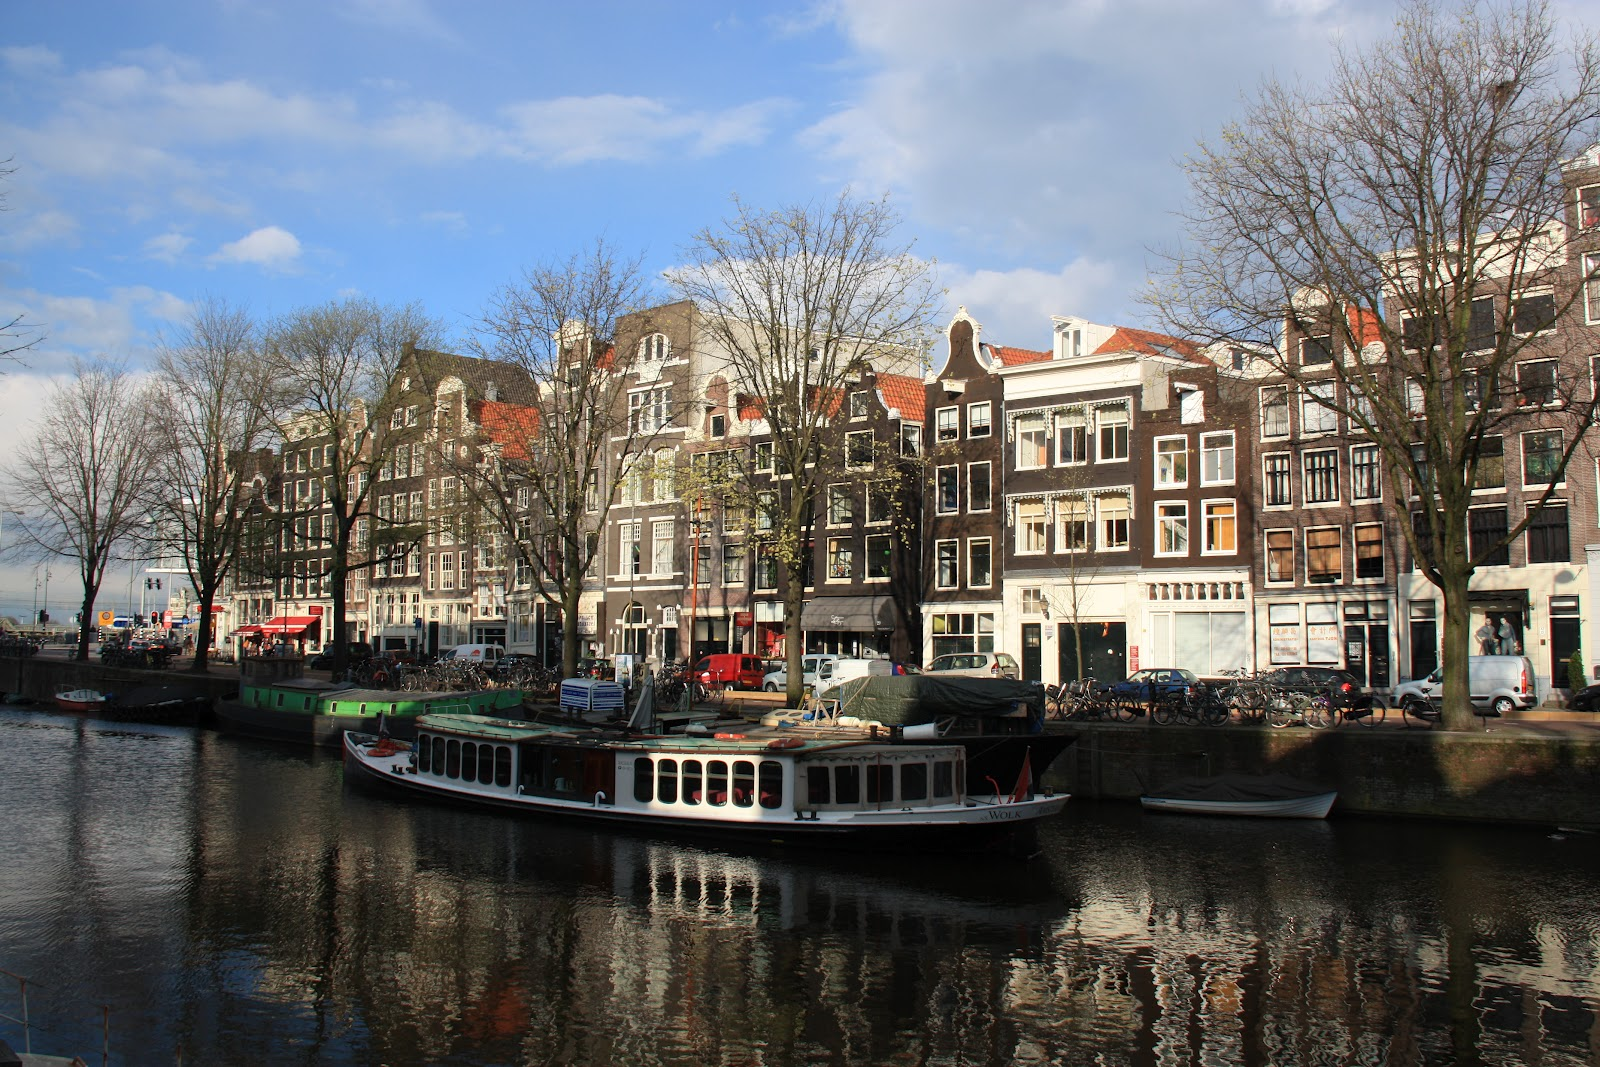 Amsterdam 阿姆斯特丹 (2) 市區 v.s. 郊區